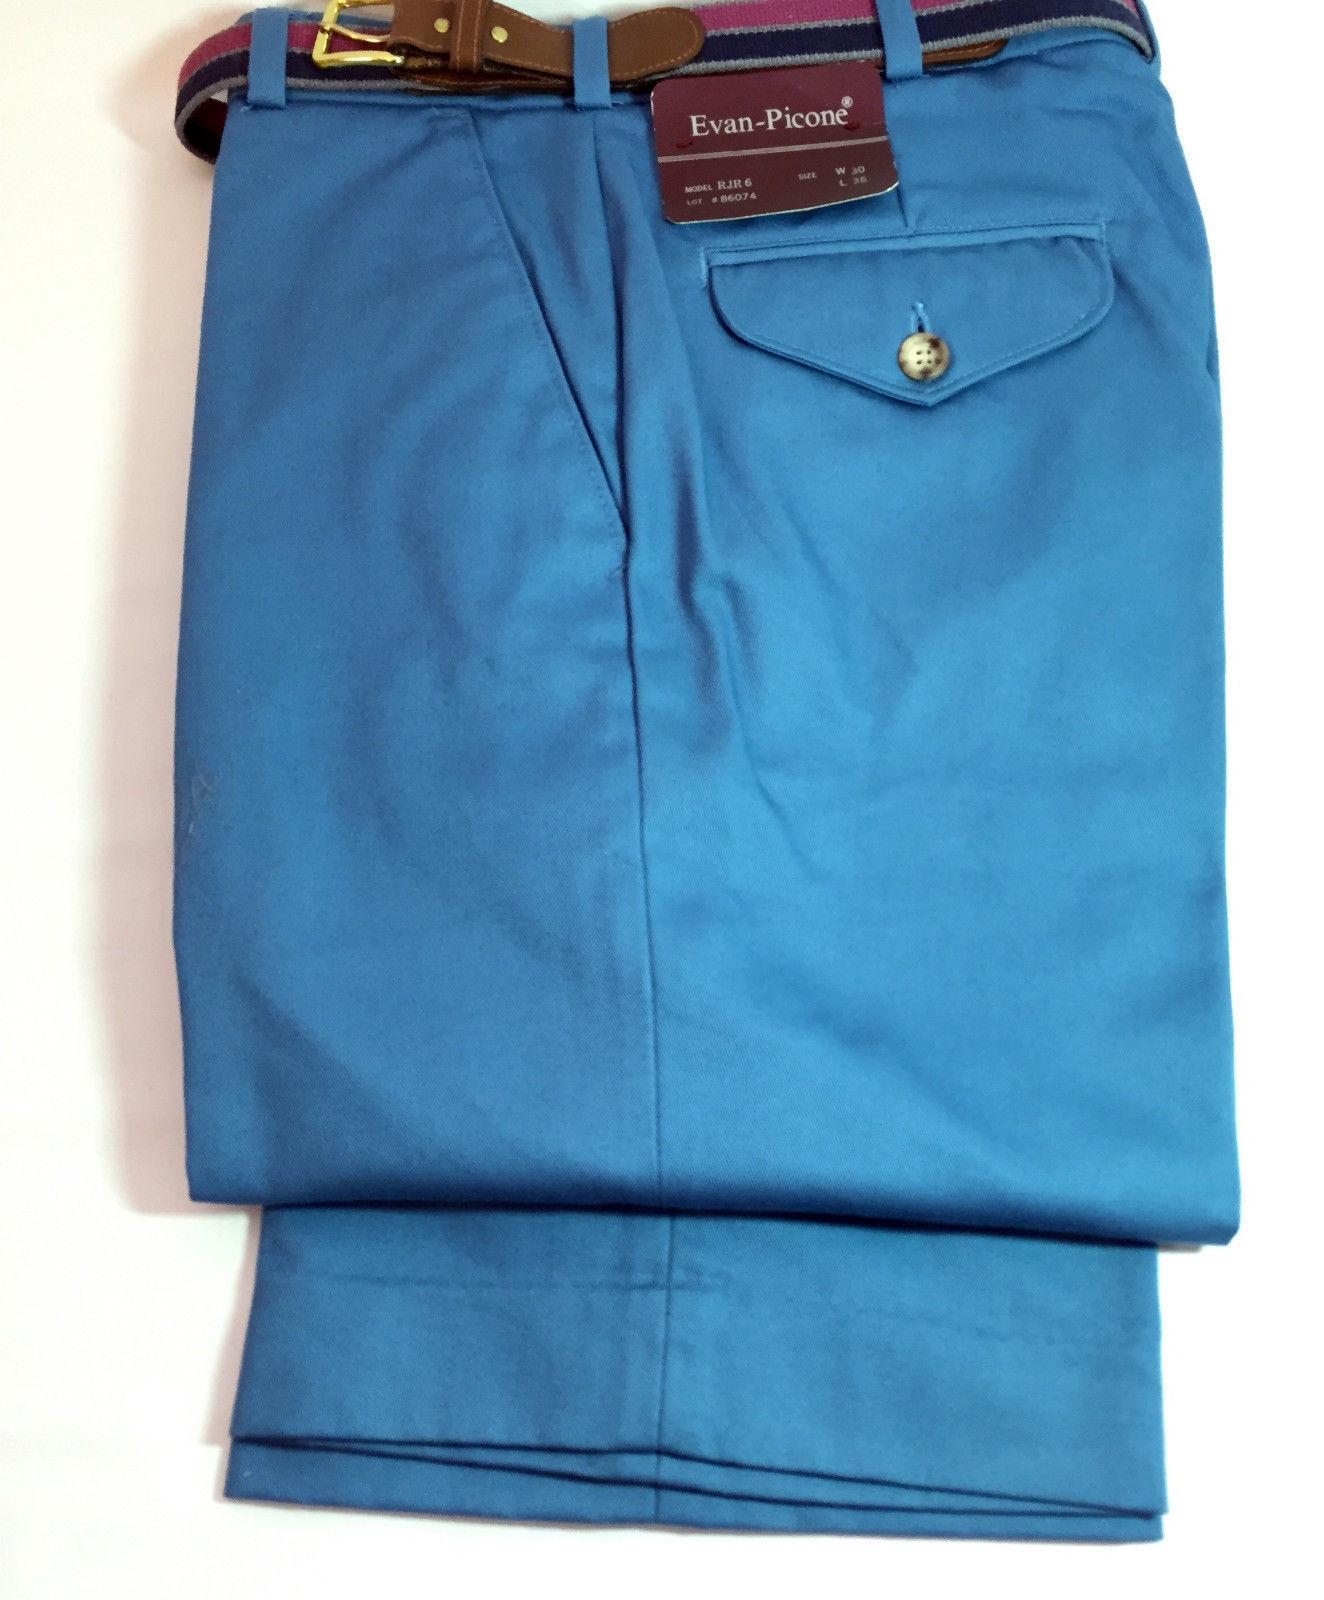 Vintage 1970s Mens Evan Picone Cornflower Blue colored ...